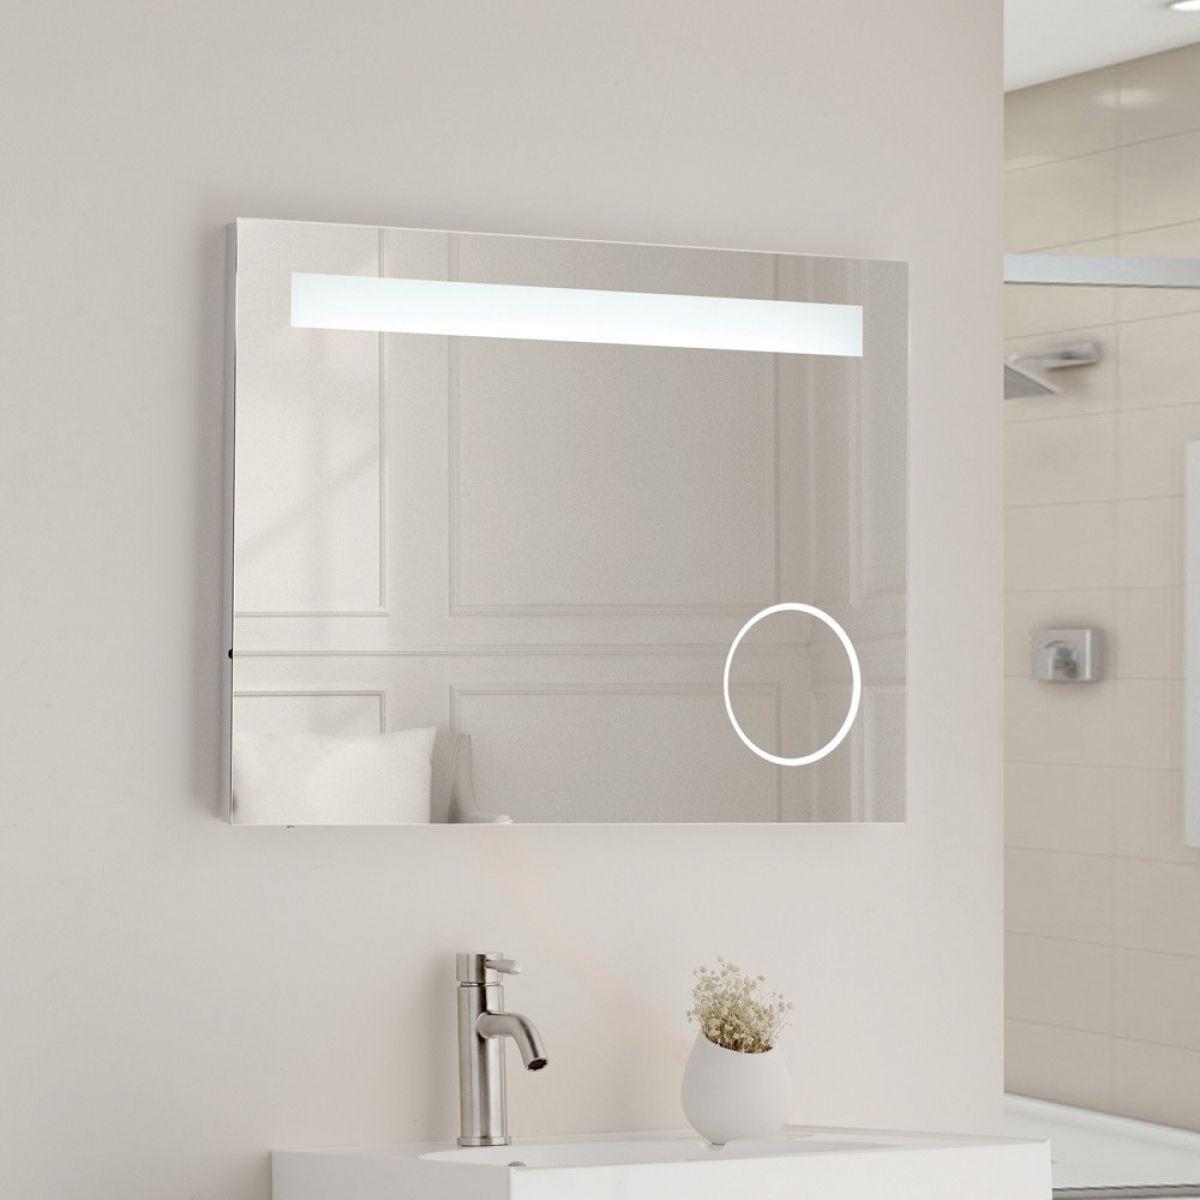 Led Bathroom Mirrors Screwfix Bathroom Mirrors with Bathroom